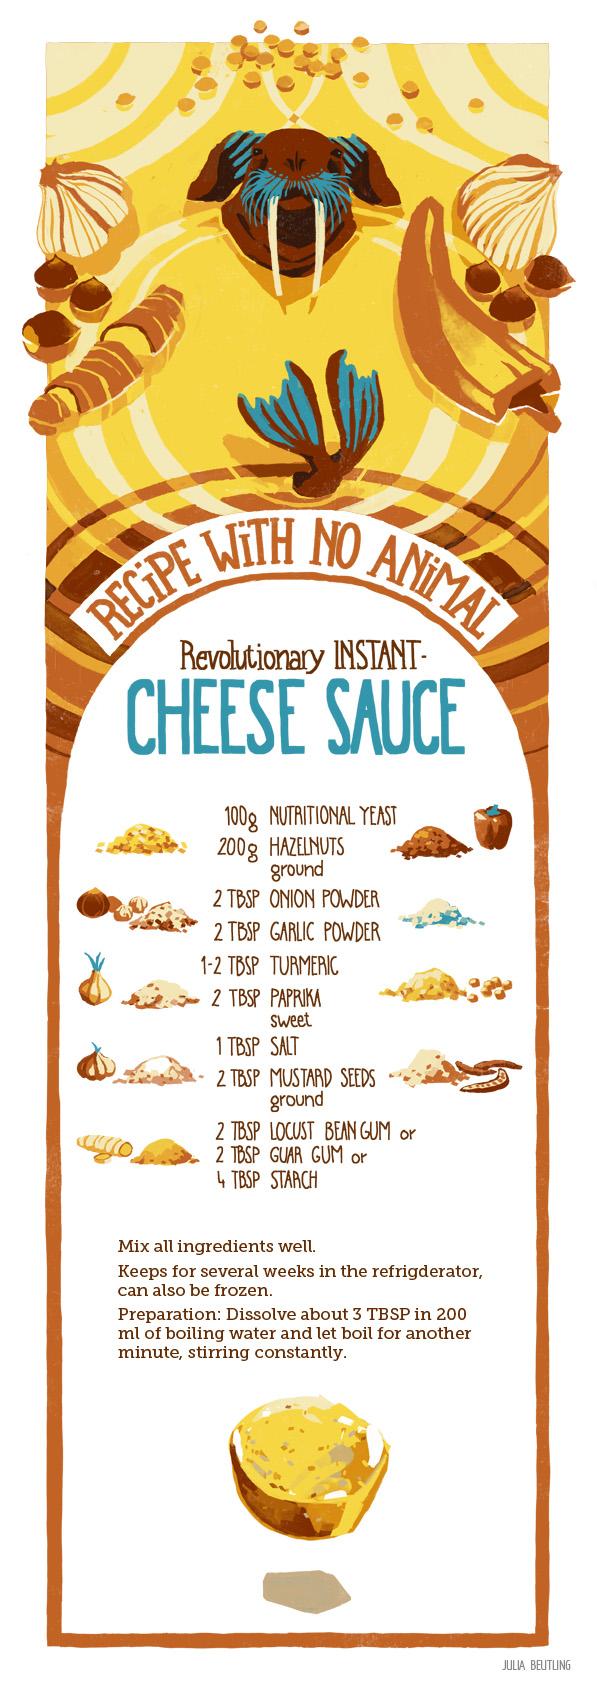 WEB rezept 8 EN cheese sauce julia beutling